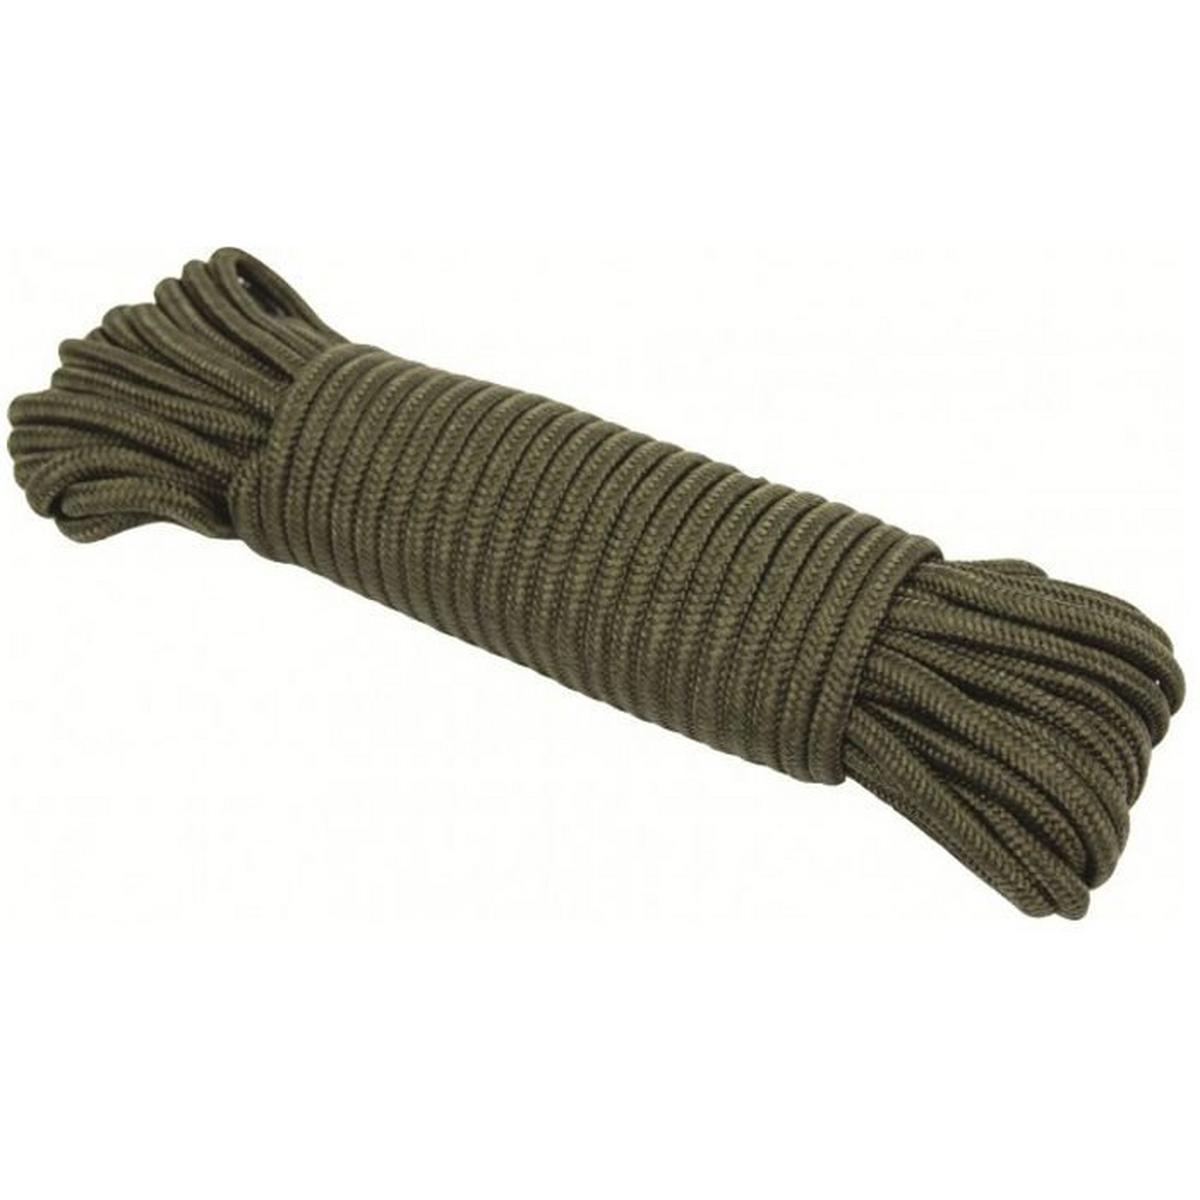 Highlander Utility Rope 5mm x 15m